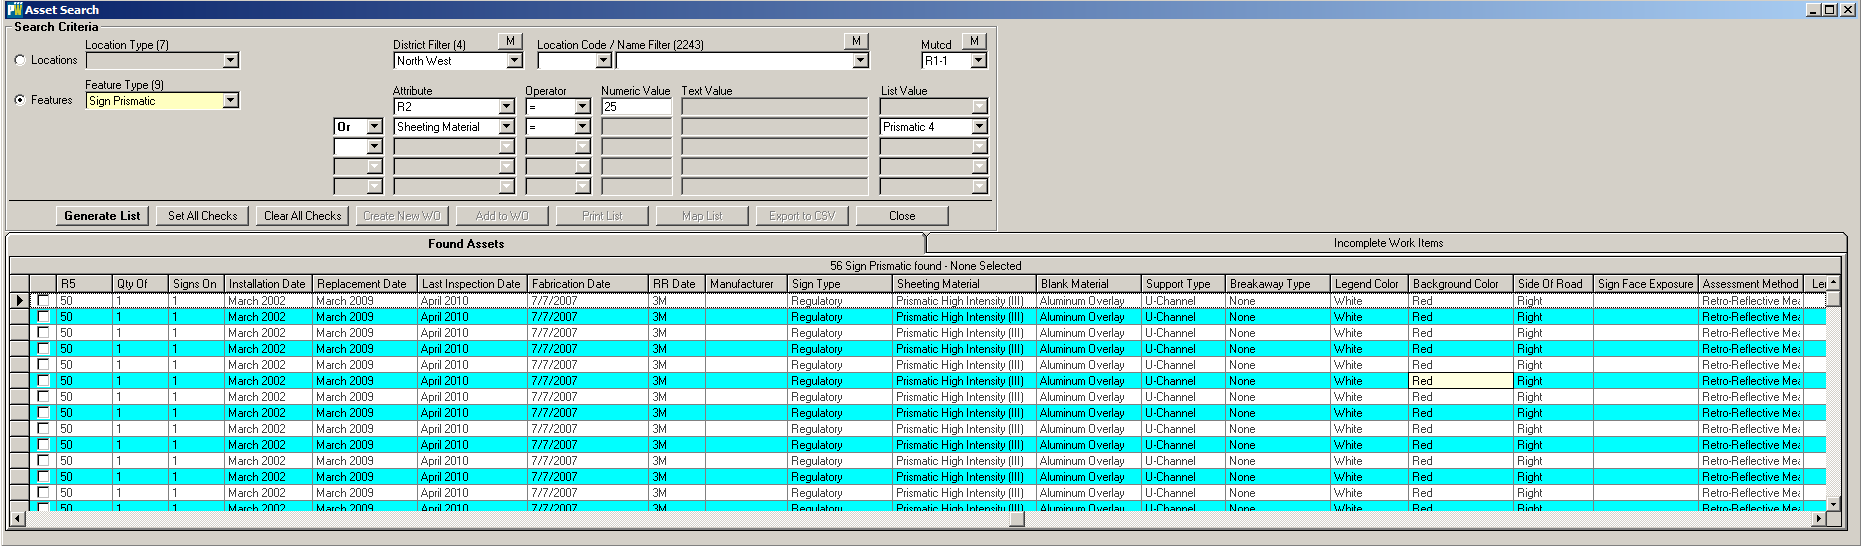 asset search screen